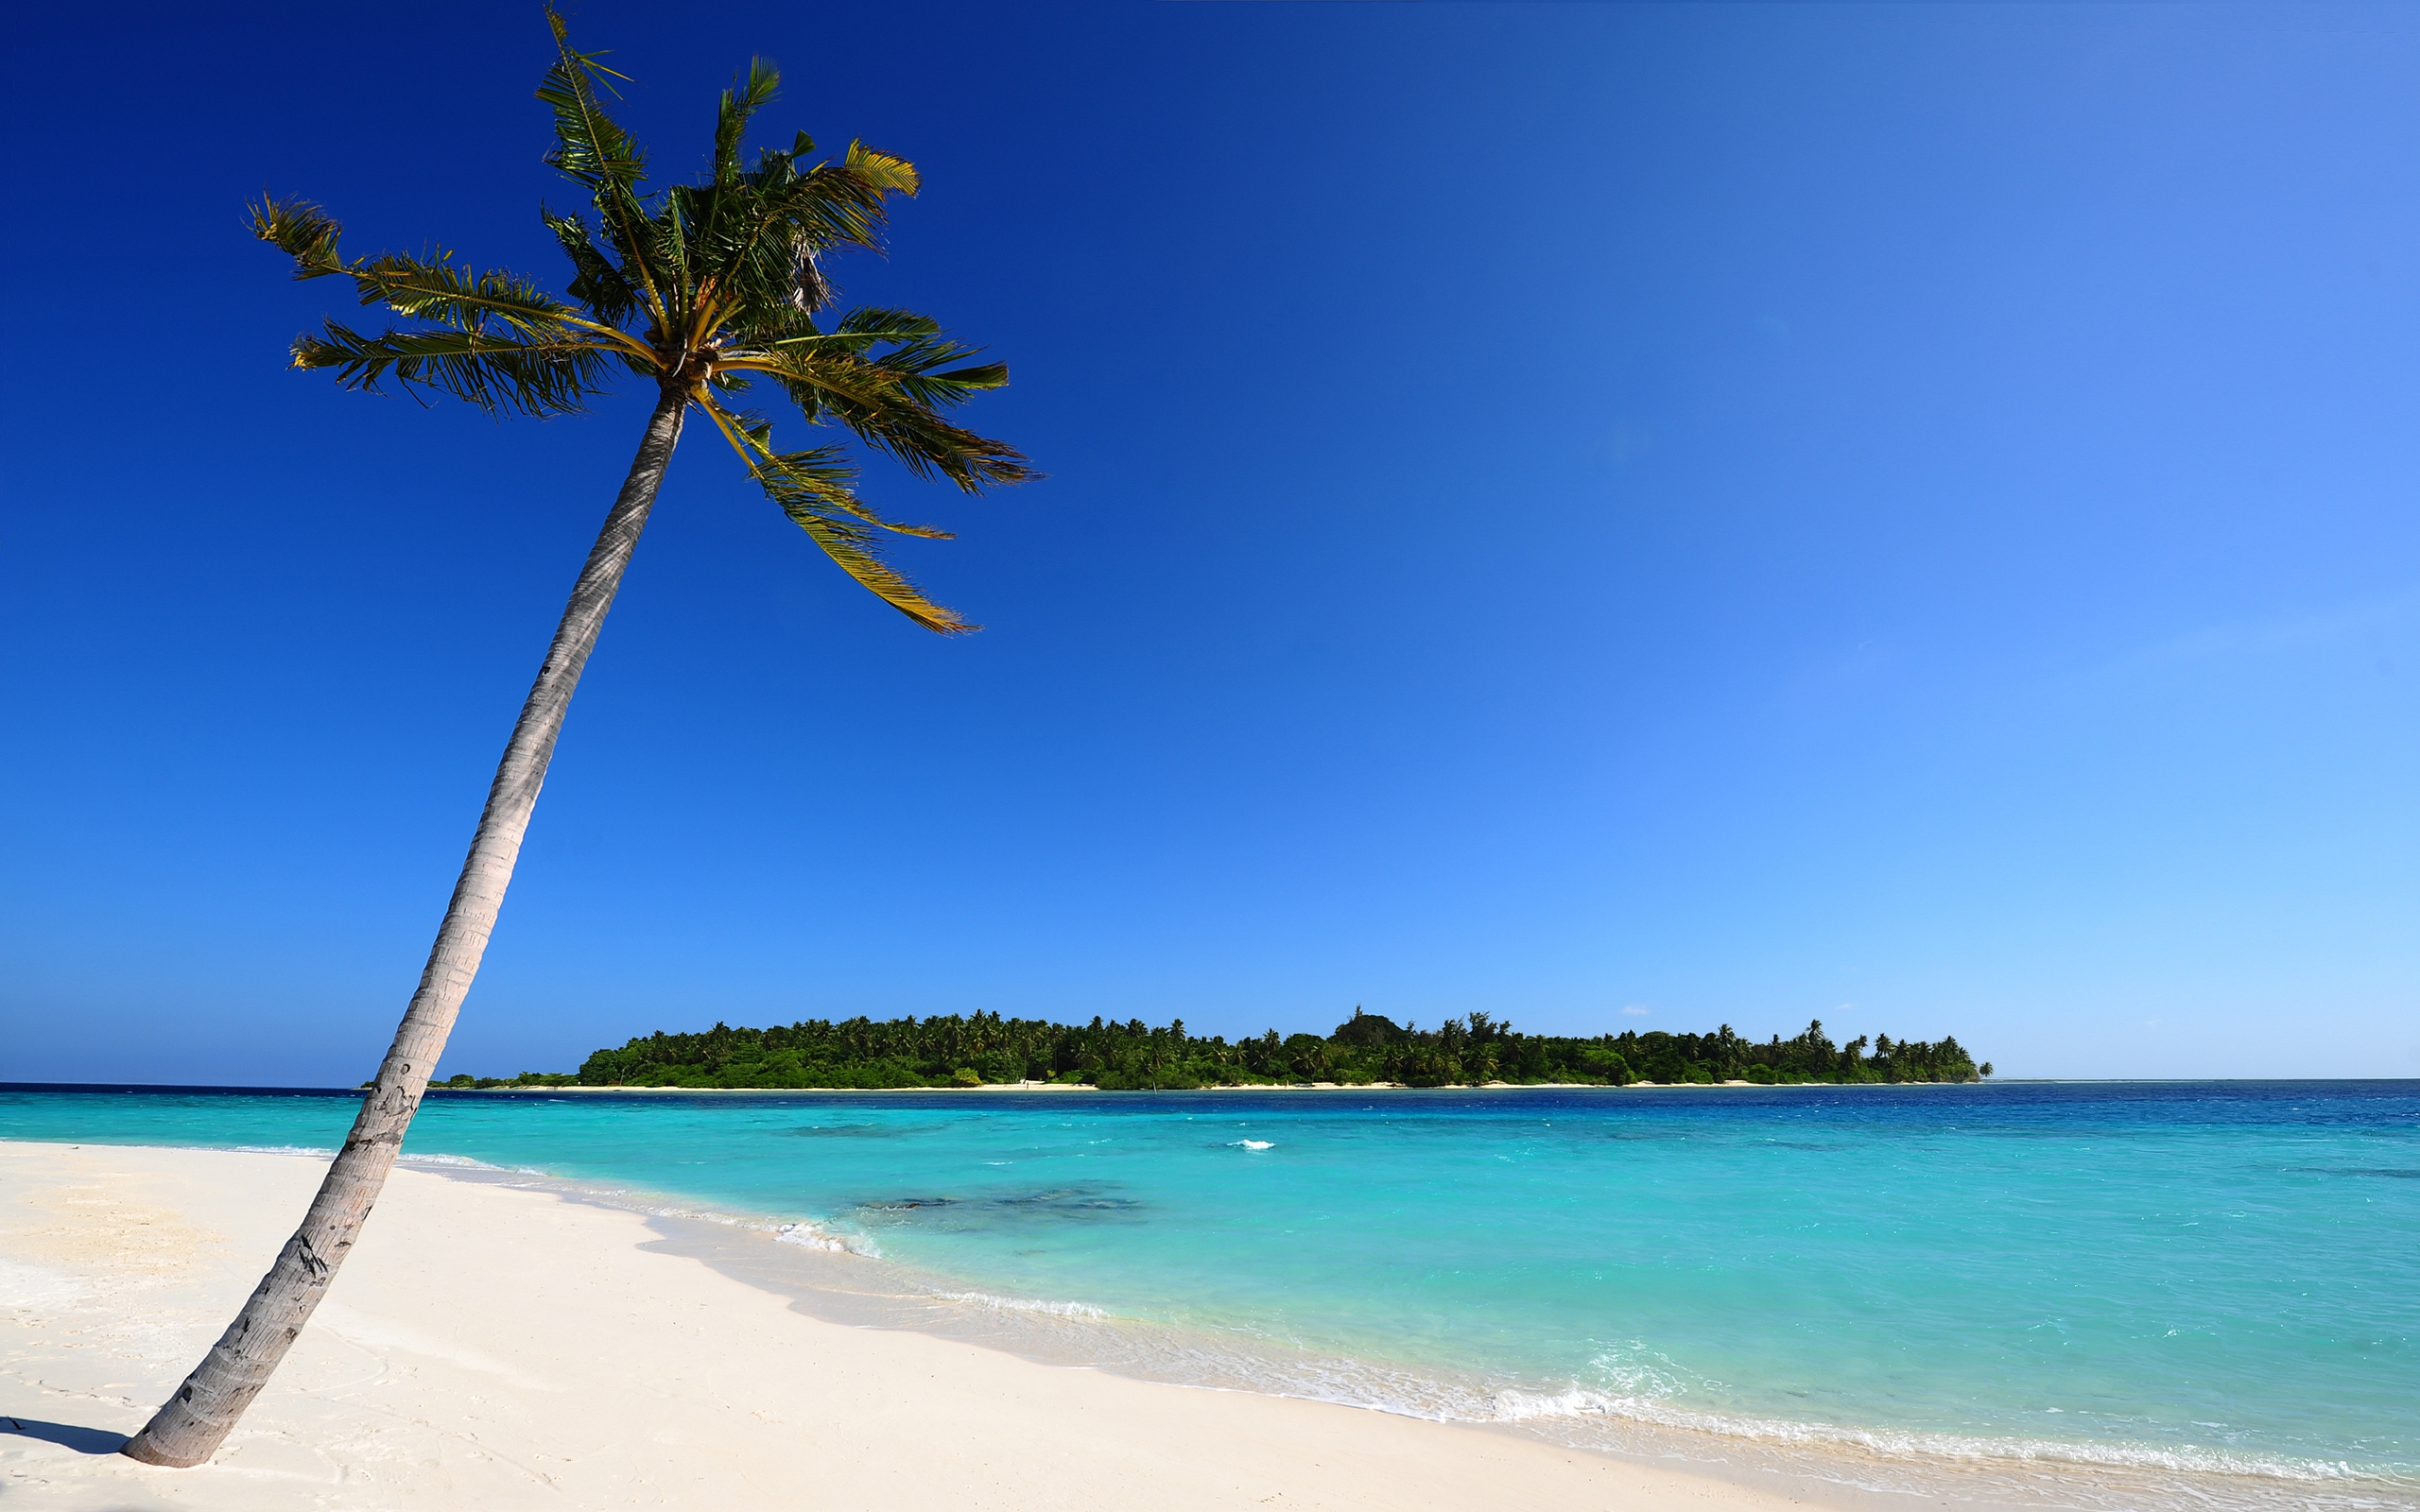 beach backgrounds beach powerpoint templates home network schematic, Modern powerpoint